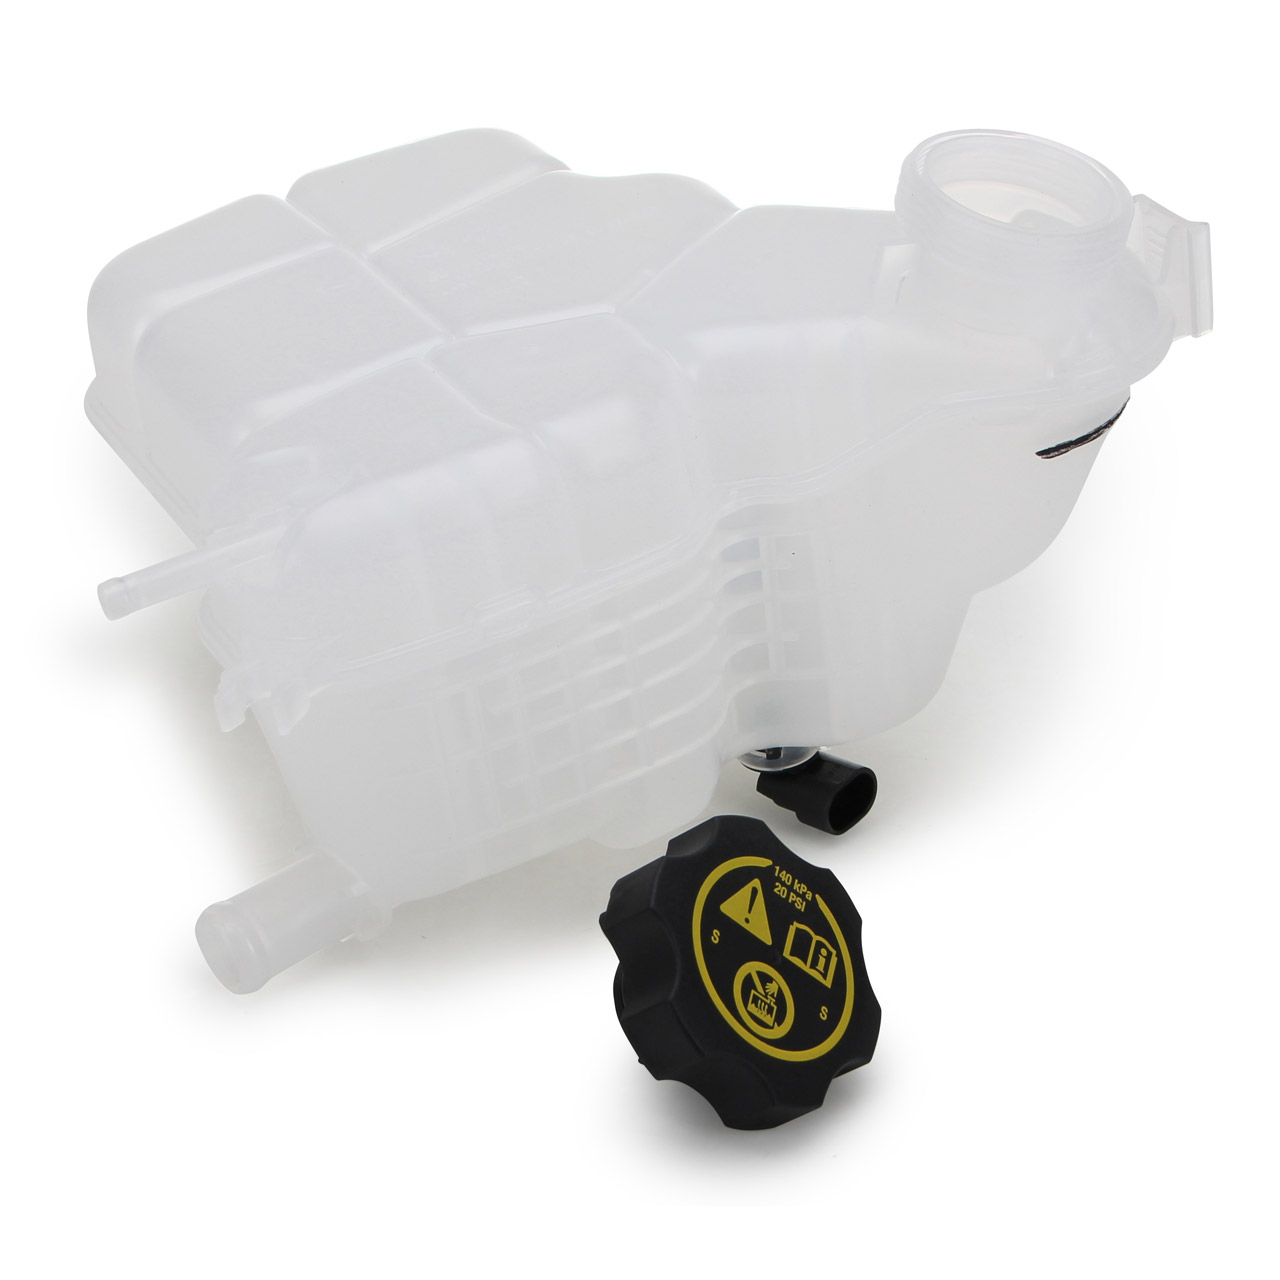 Ausgleichsbehälter + Sensor + Verschlussdeckel OPEL Zafira C bis Fgst. E2999999